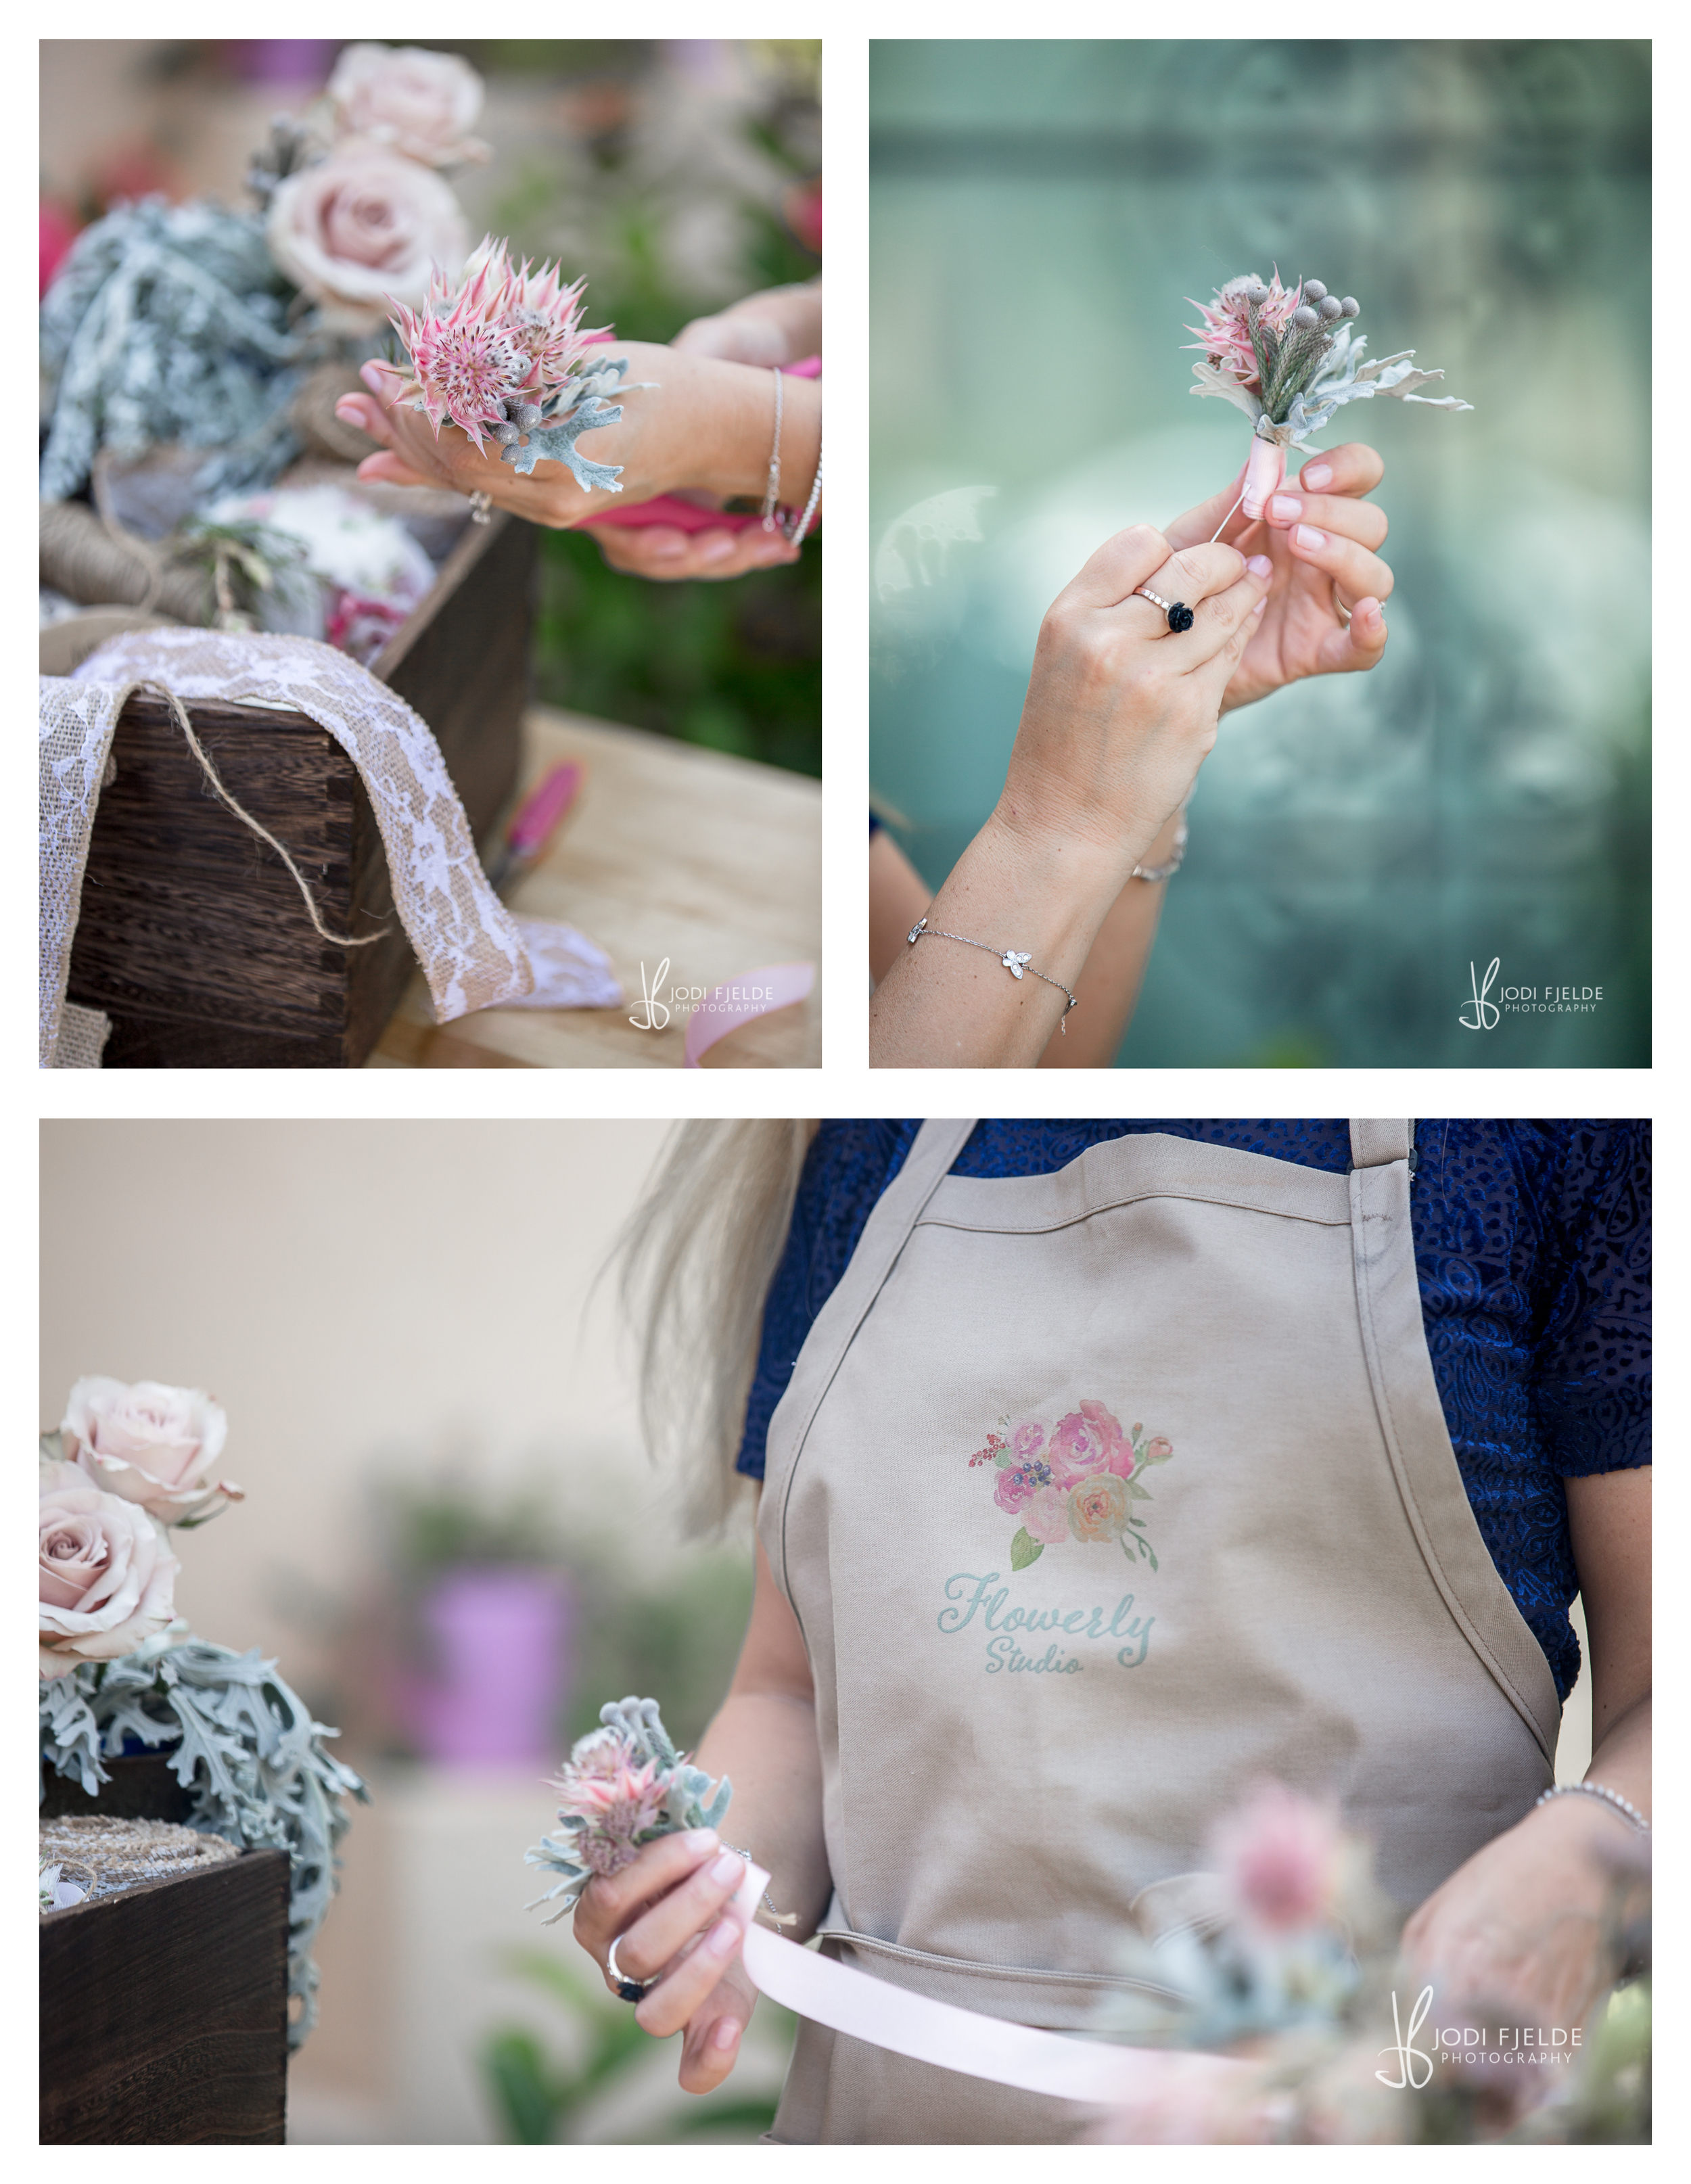 Parkland_Commercial_Business_Branding_Photography_Flowerly Studio_Jodi_Fjelde_Photogrpahy_5.jpg